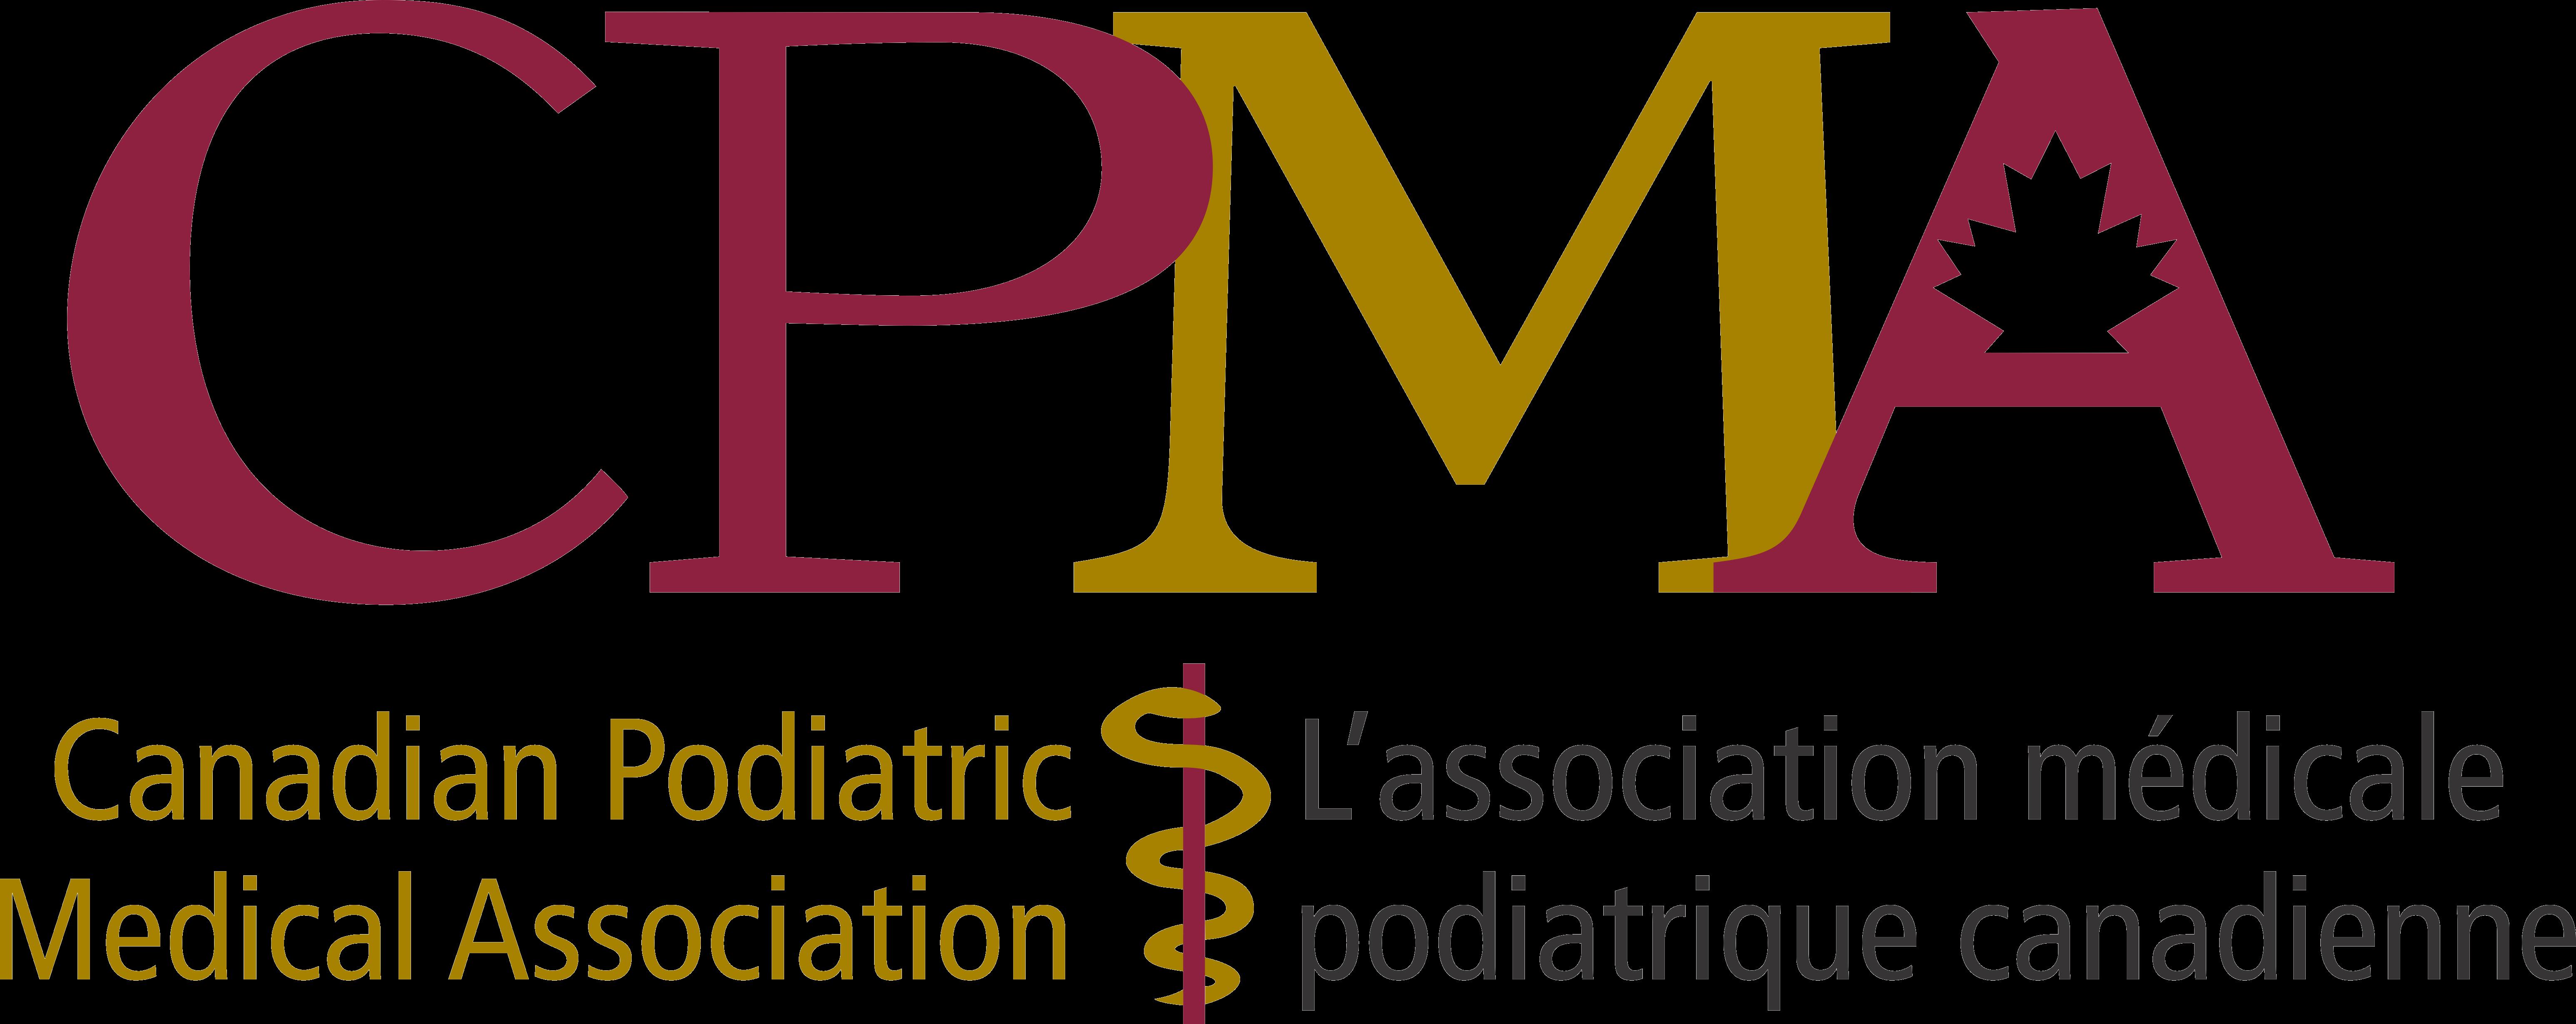 CPMA_logo